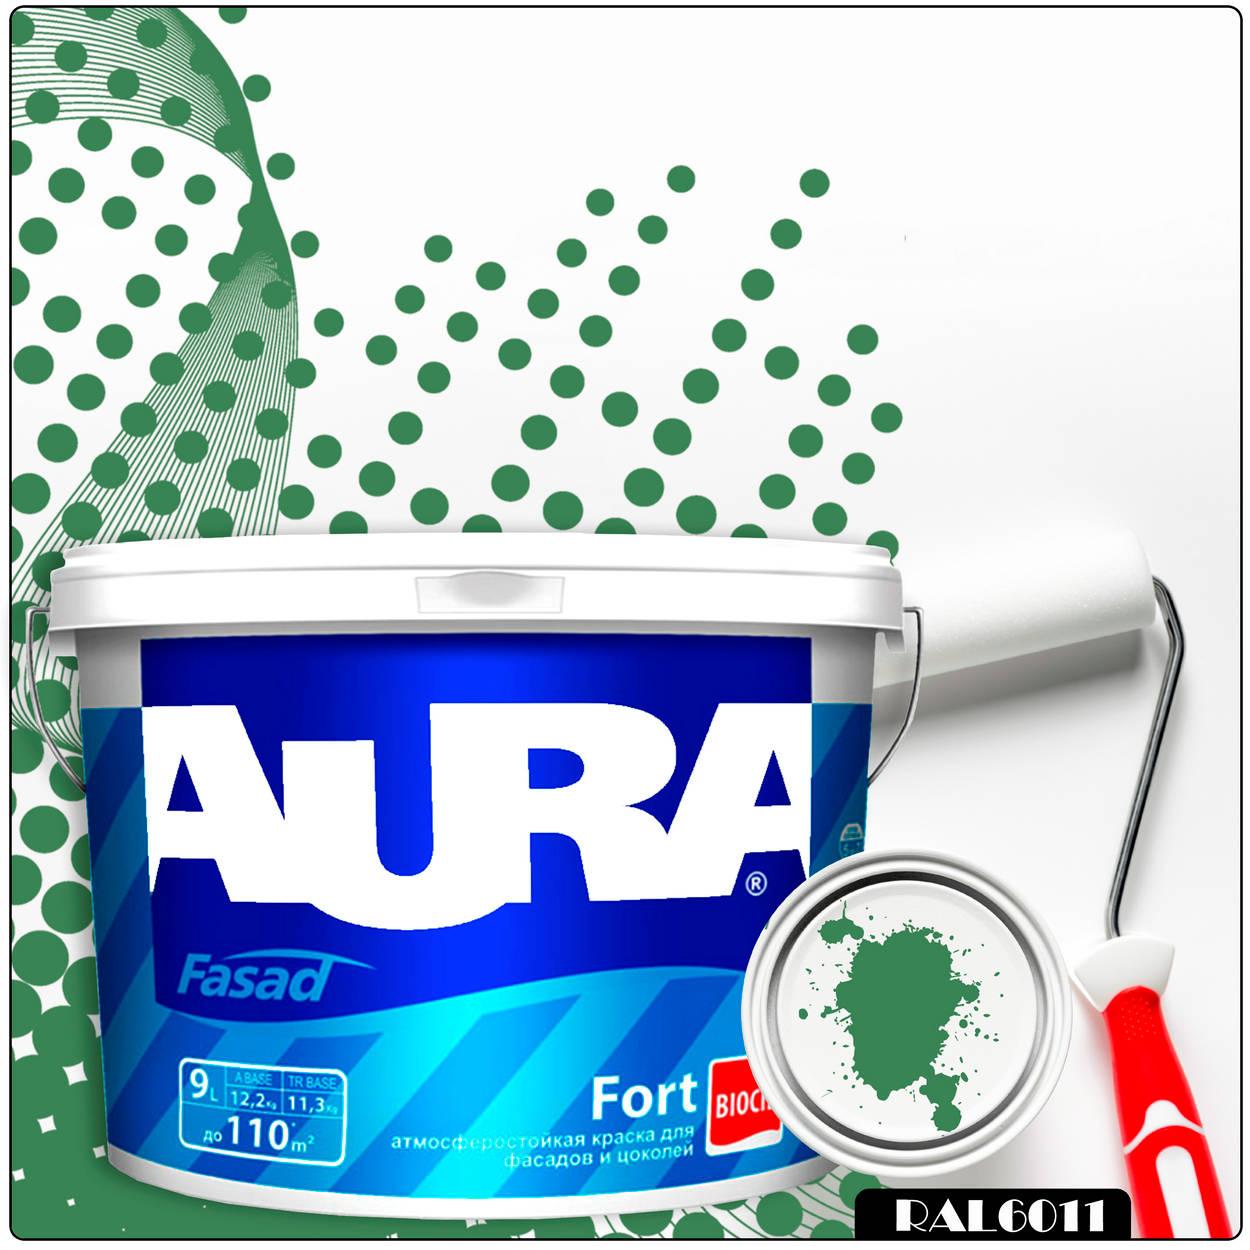 Фото 12 - Краска Aura Fasad Fort, RAL 6011 Зеленая резеда, латексная, матовая, для фасада и цоколей, 9л, Аура.